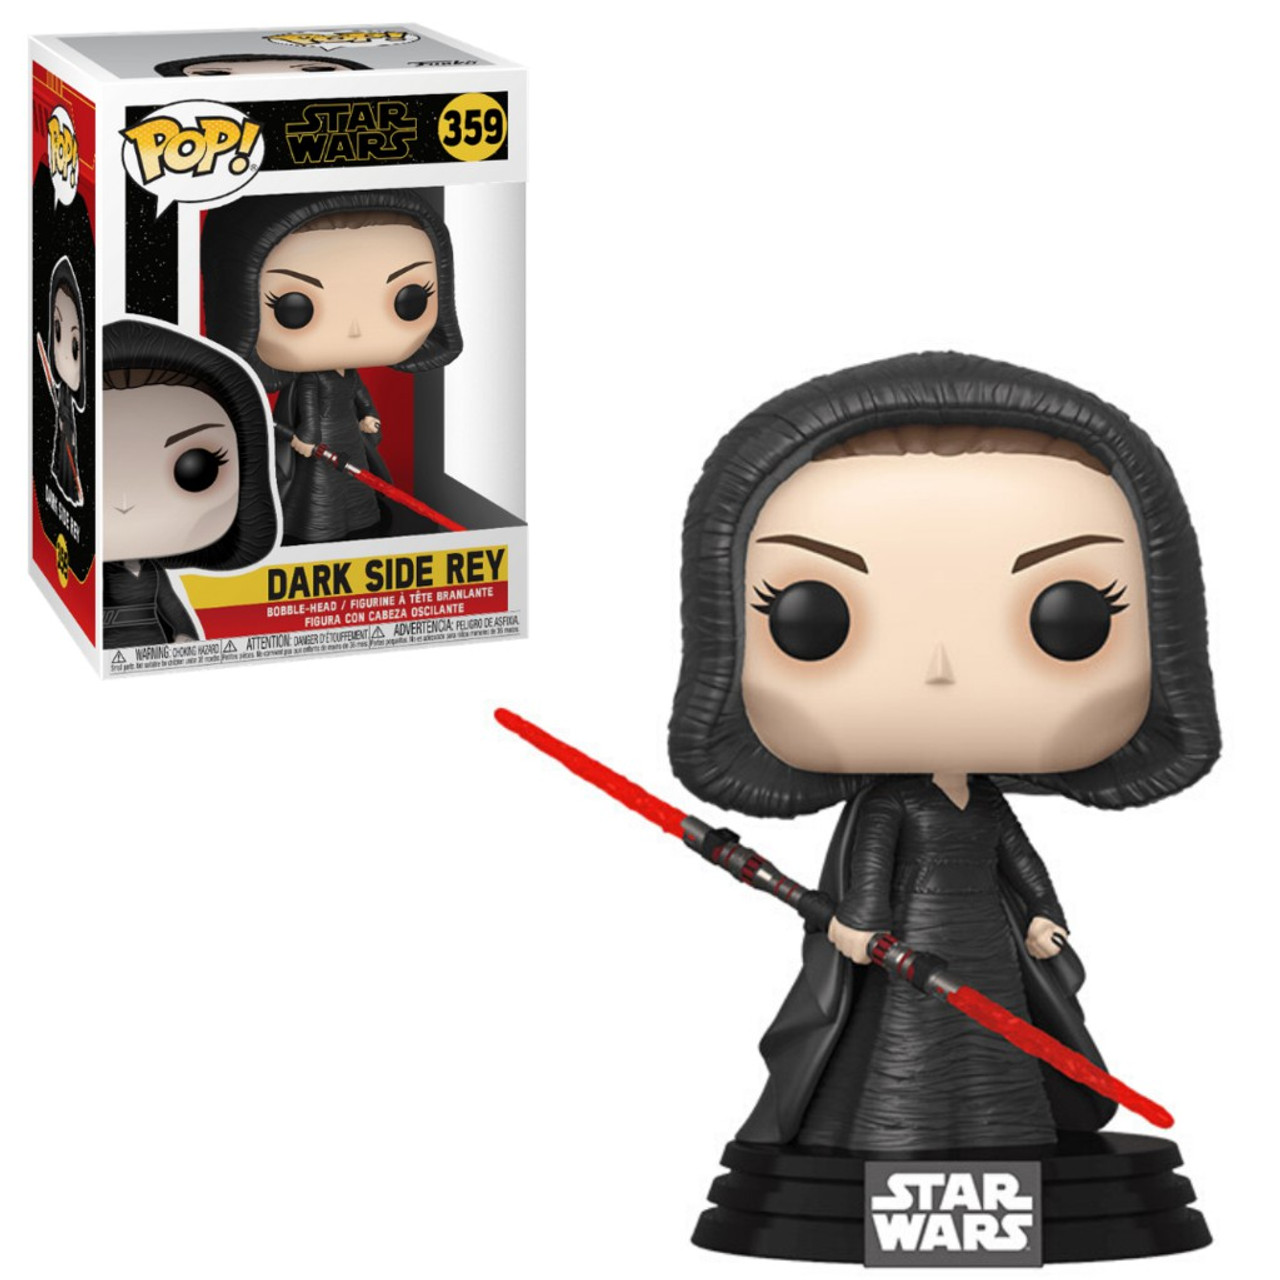 Funko Star Wars The Rise Of Skywalker Pop Star Wars Dark Side Rey Vinyl Figure 359 Toywiz